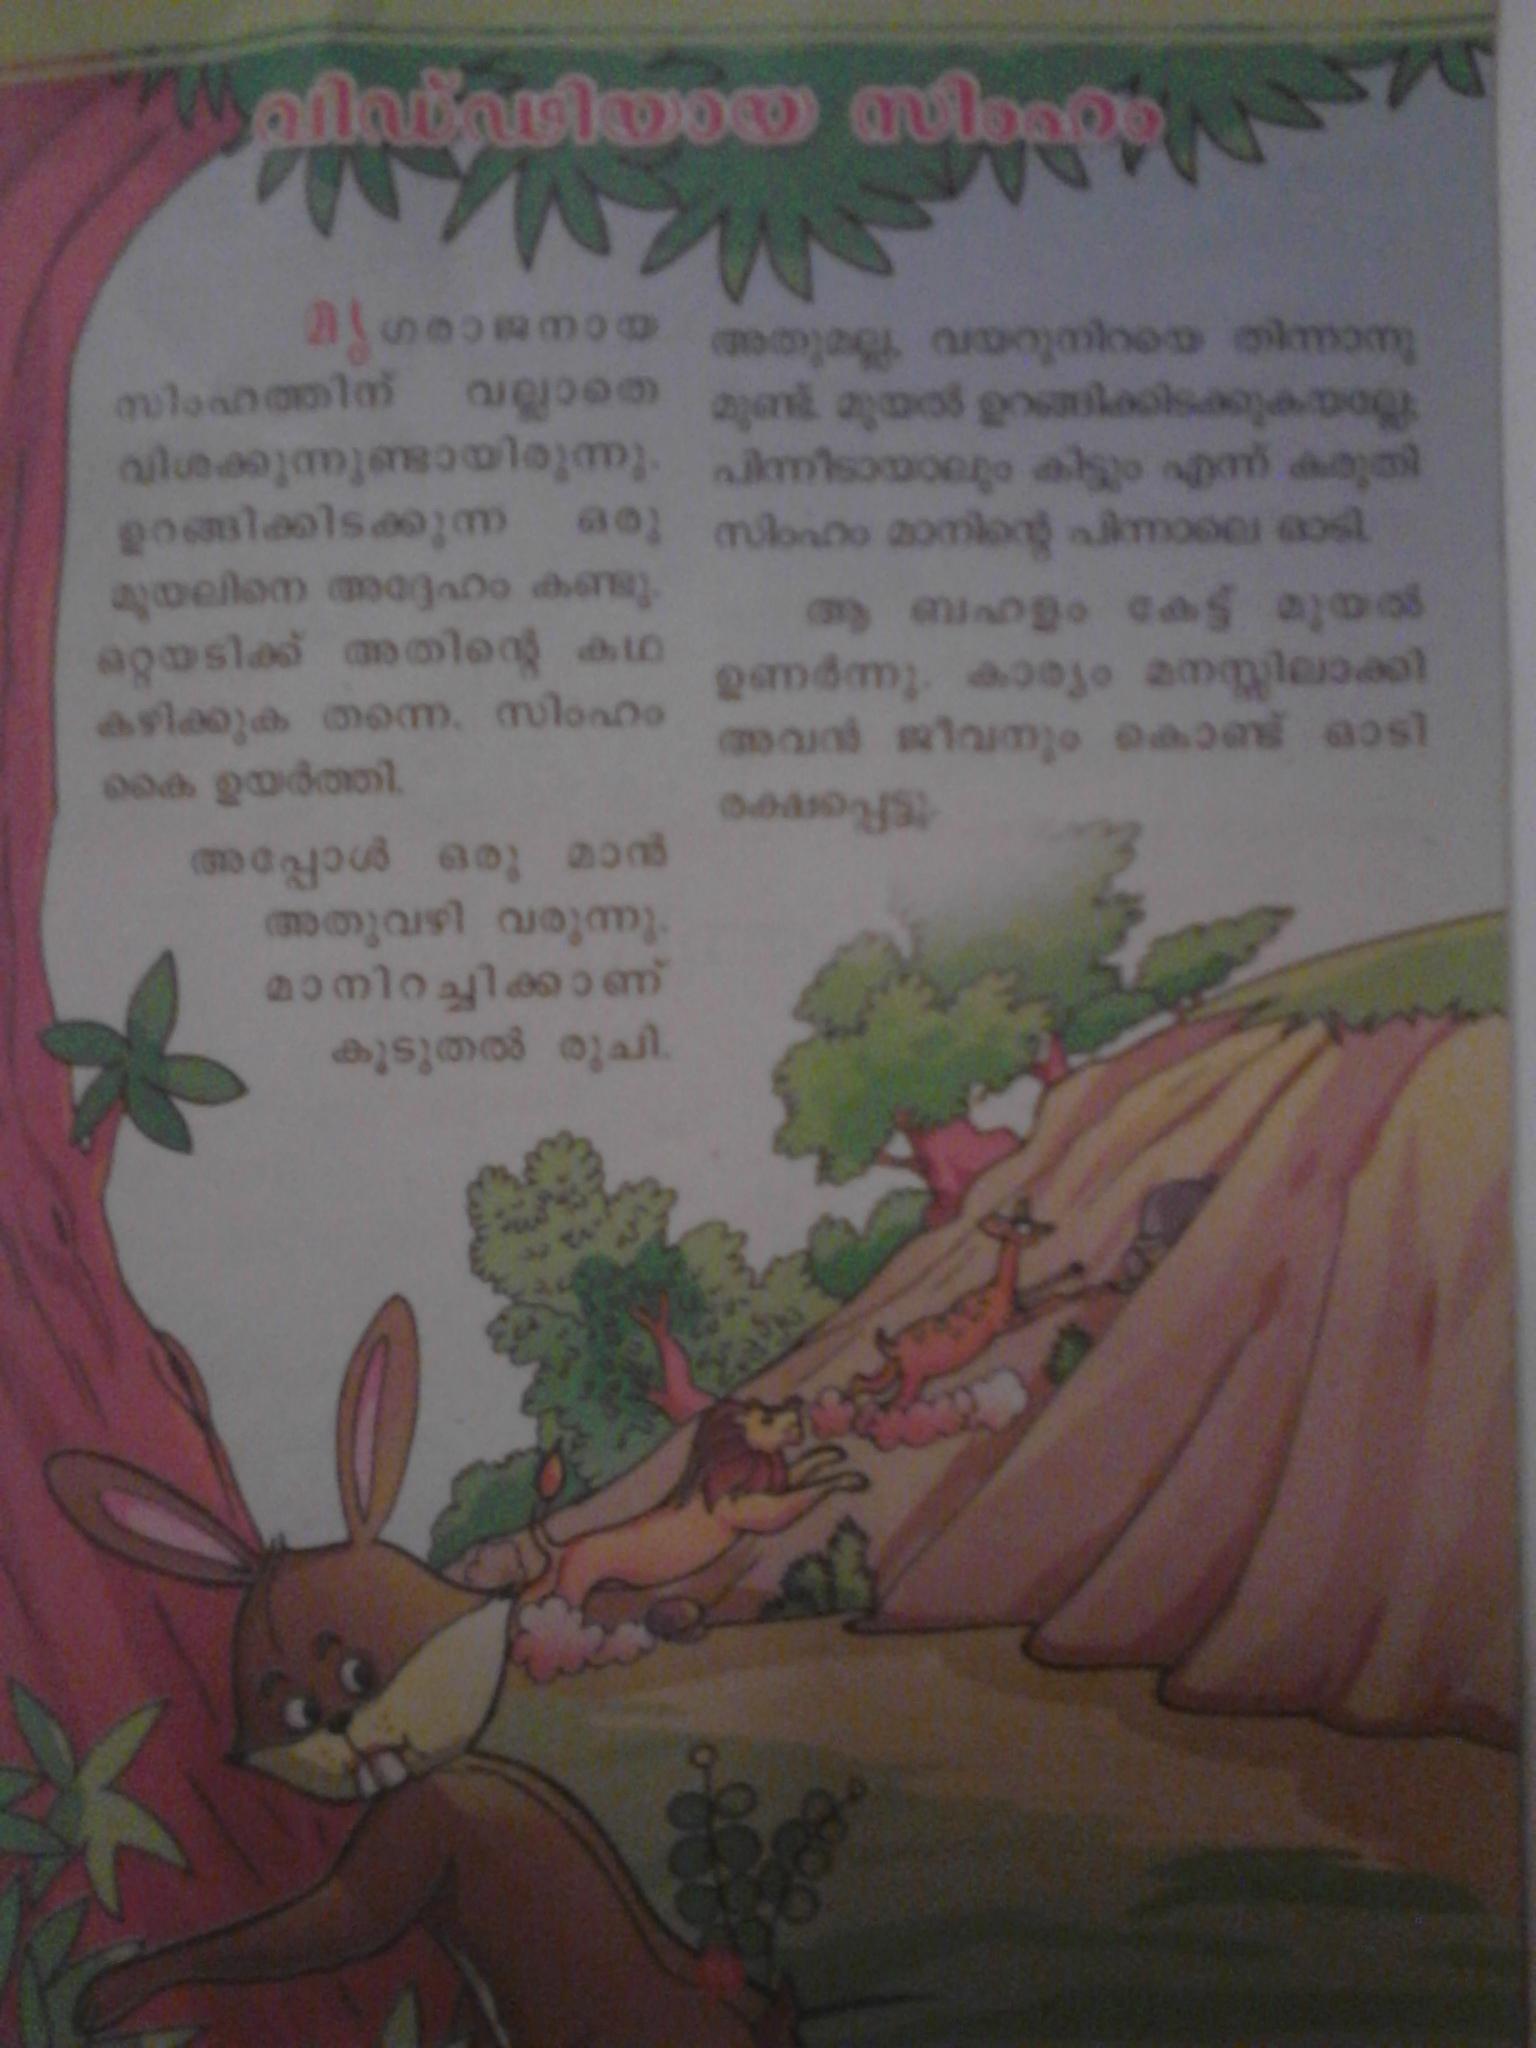 song and story Malayalam 2 kunjikadhagal | kutti sarva